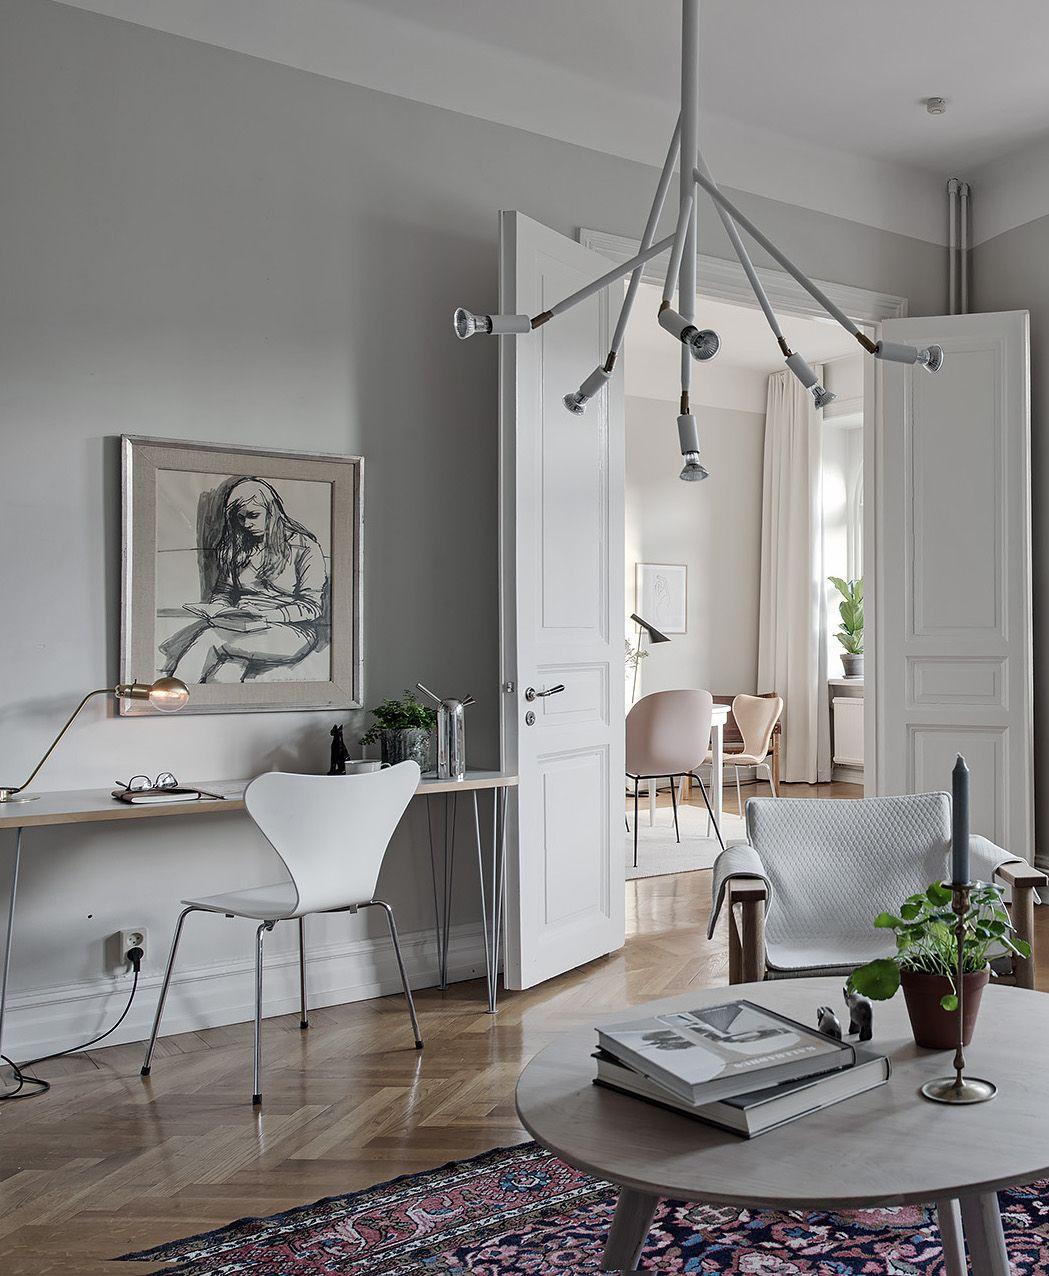 Stylish Apartment With A Soft Look Via Coco Lapine Design Blog - Apartment soft minimalist decor